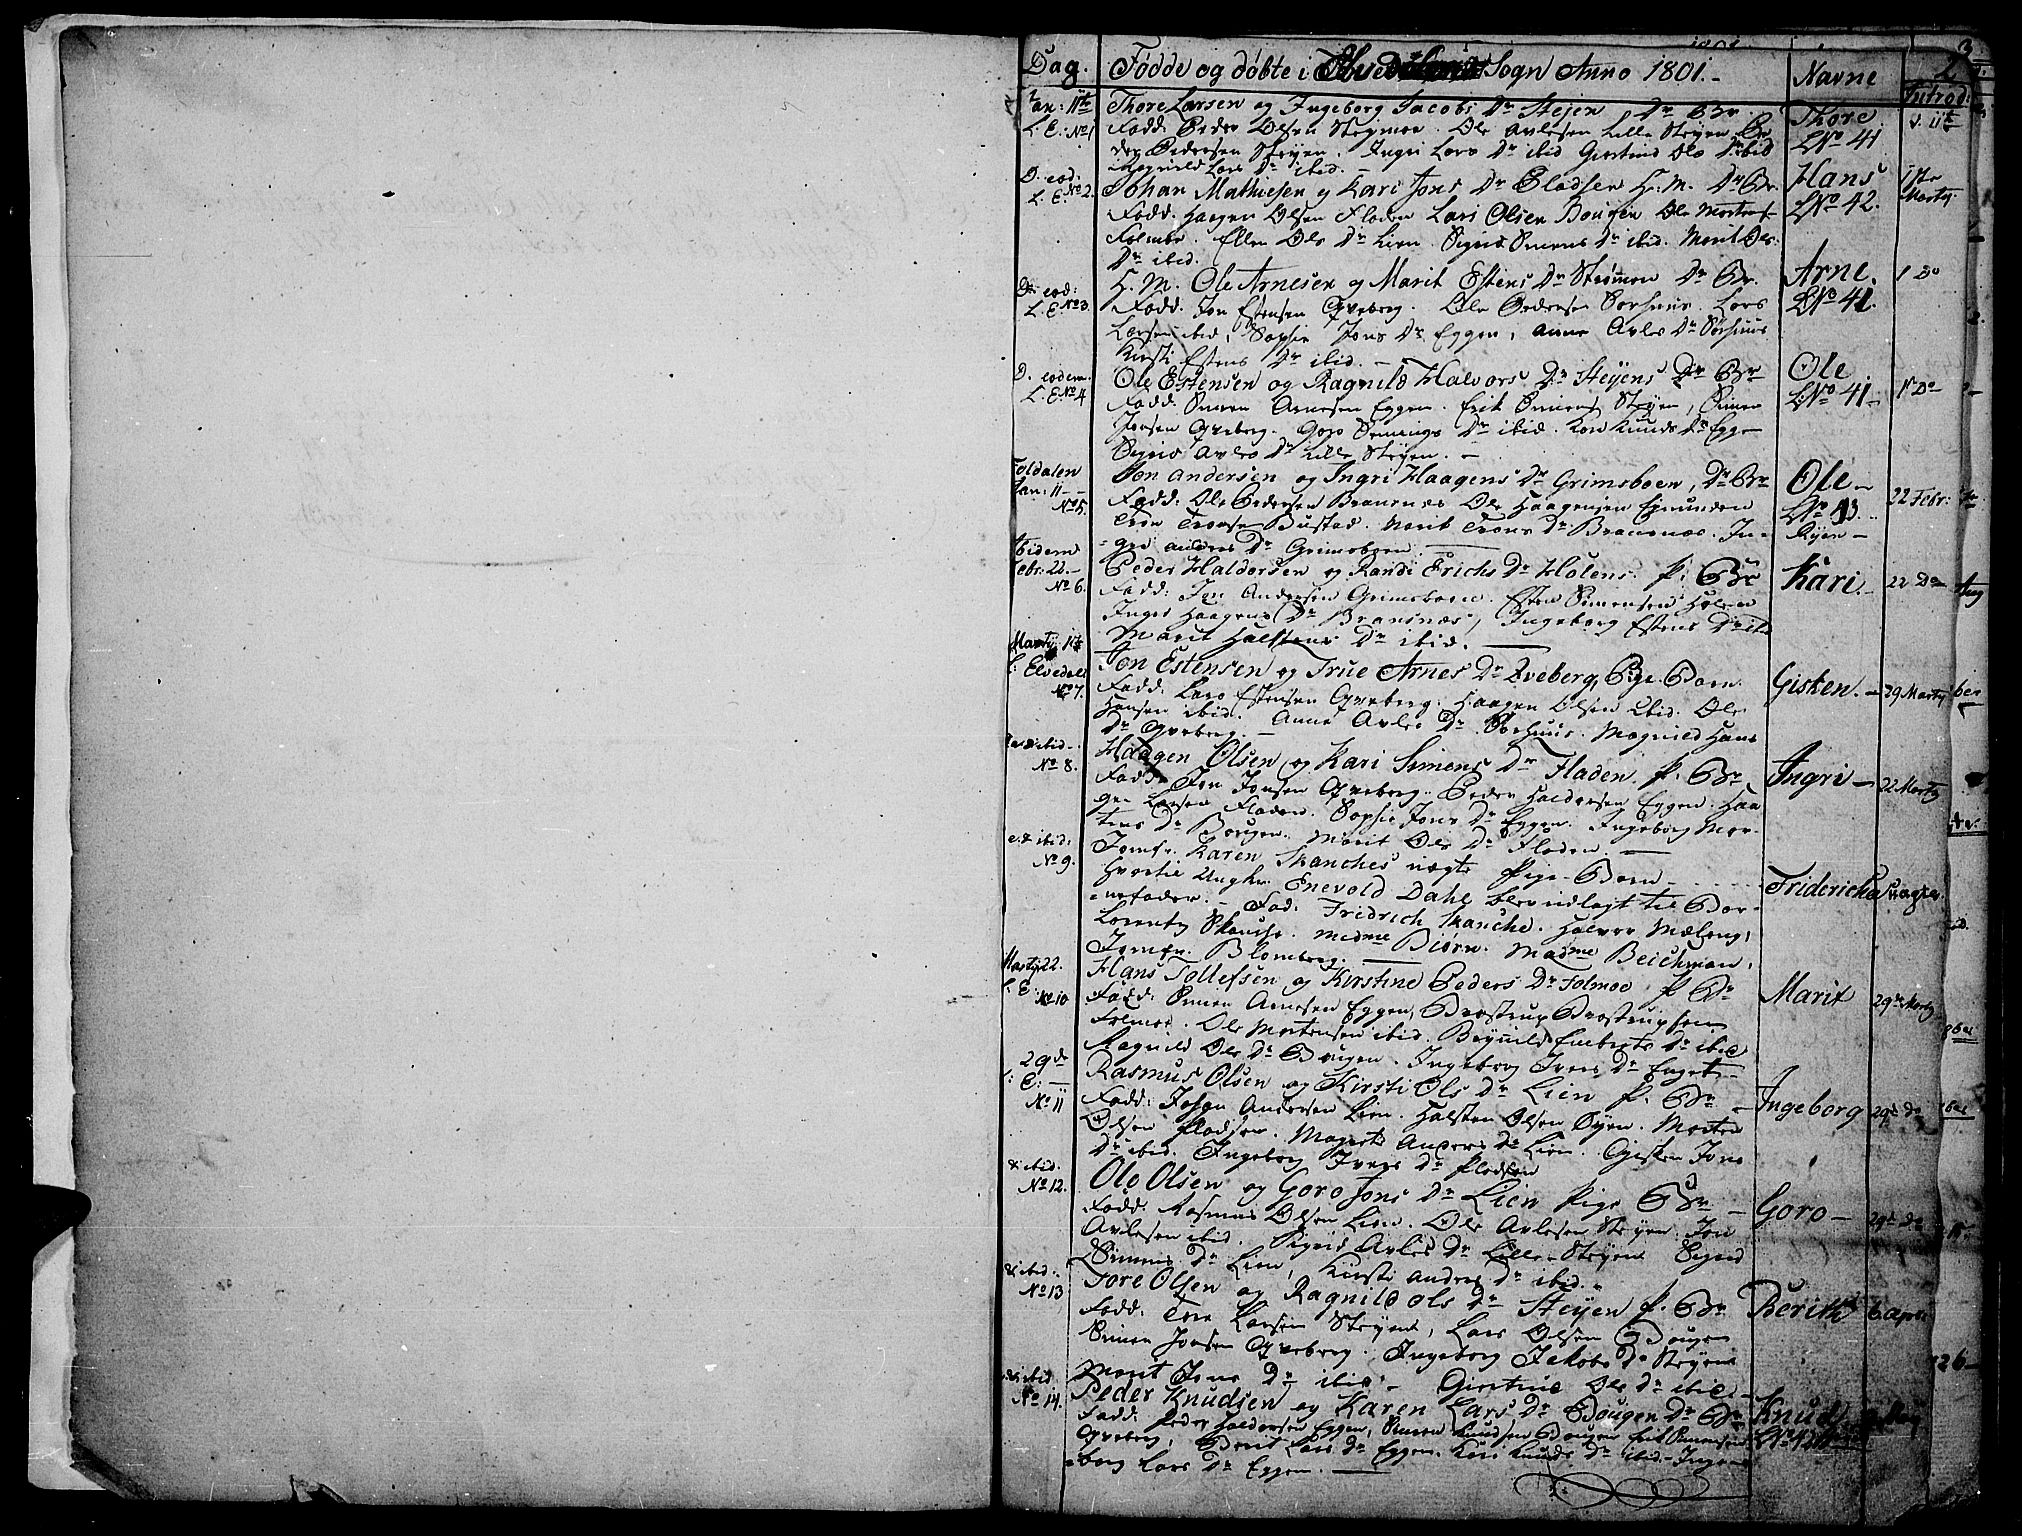 SAH, Tynset prestekontor, Ministerialbok nr. 16, 1801-1814, s. 2